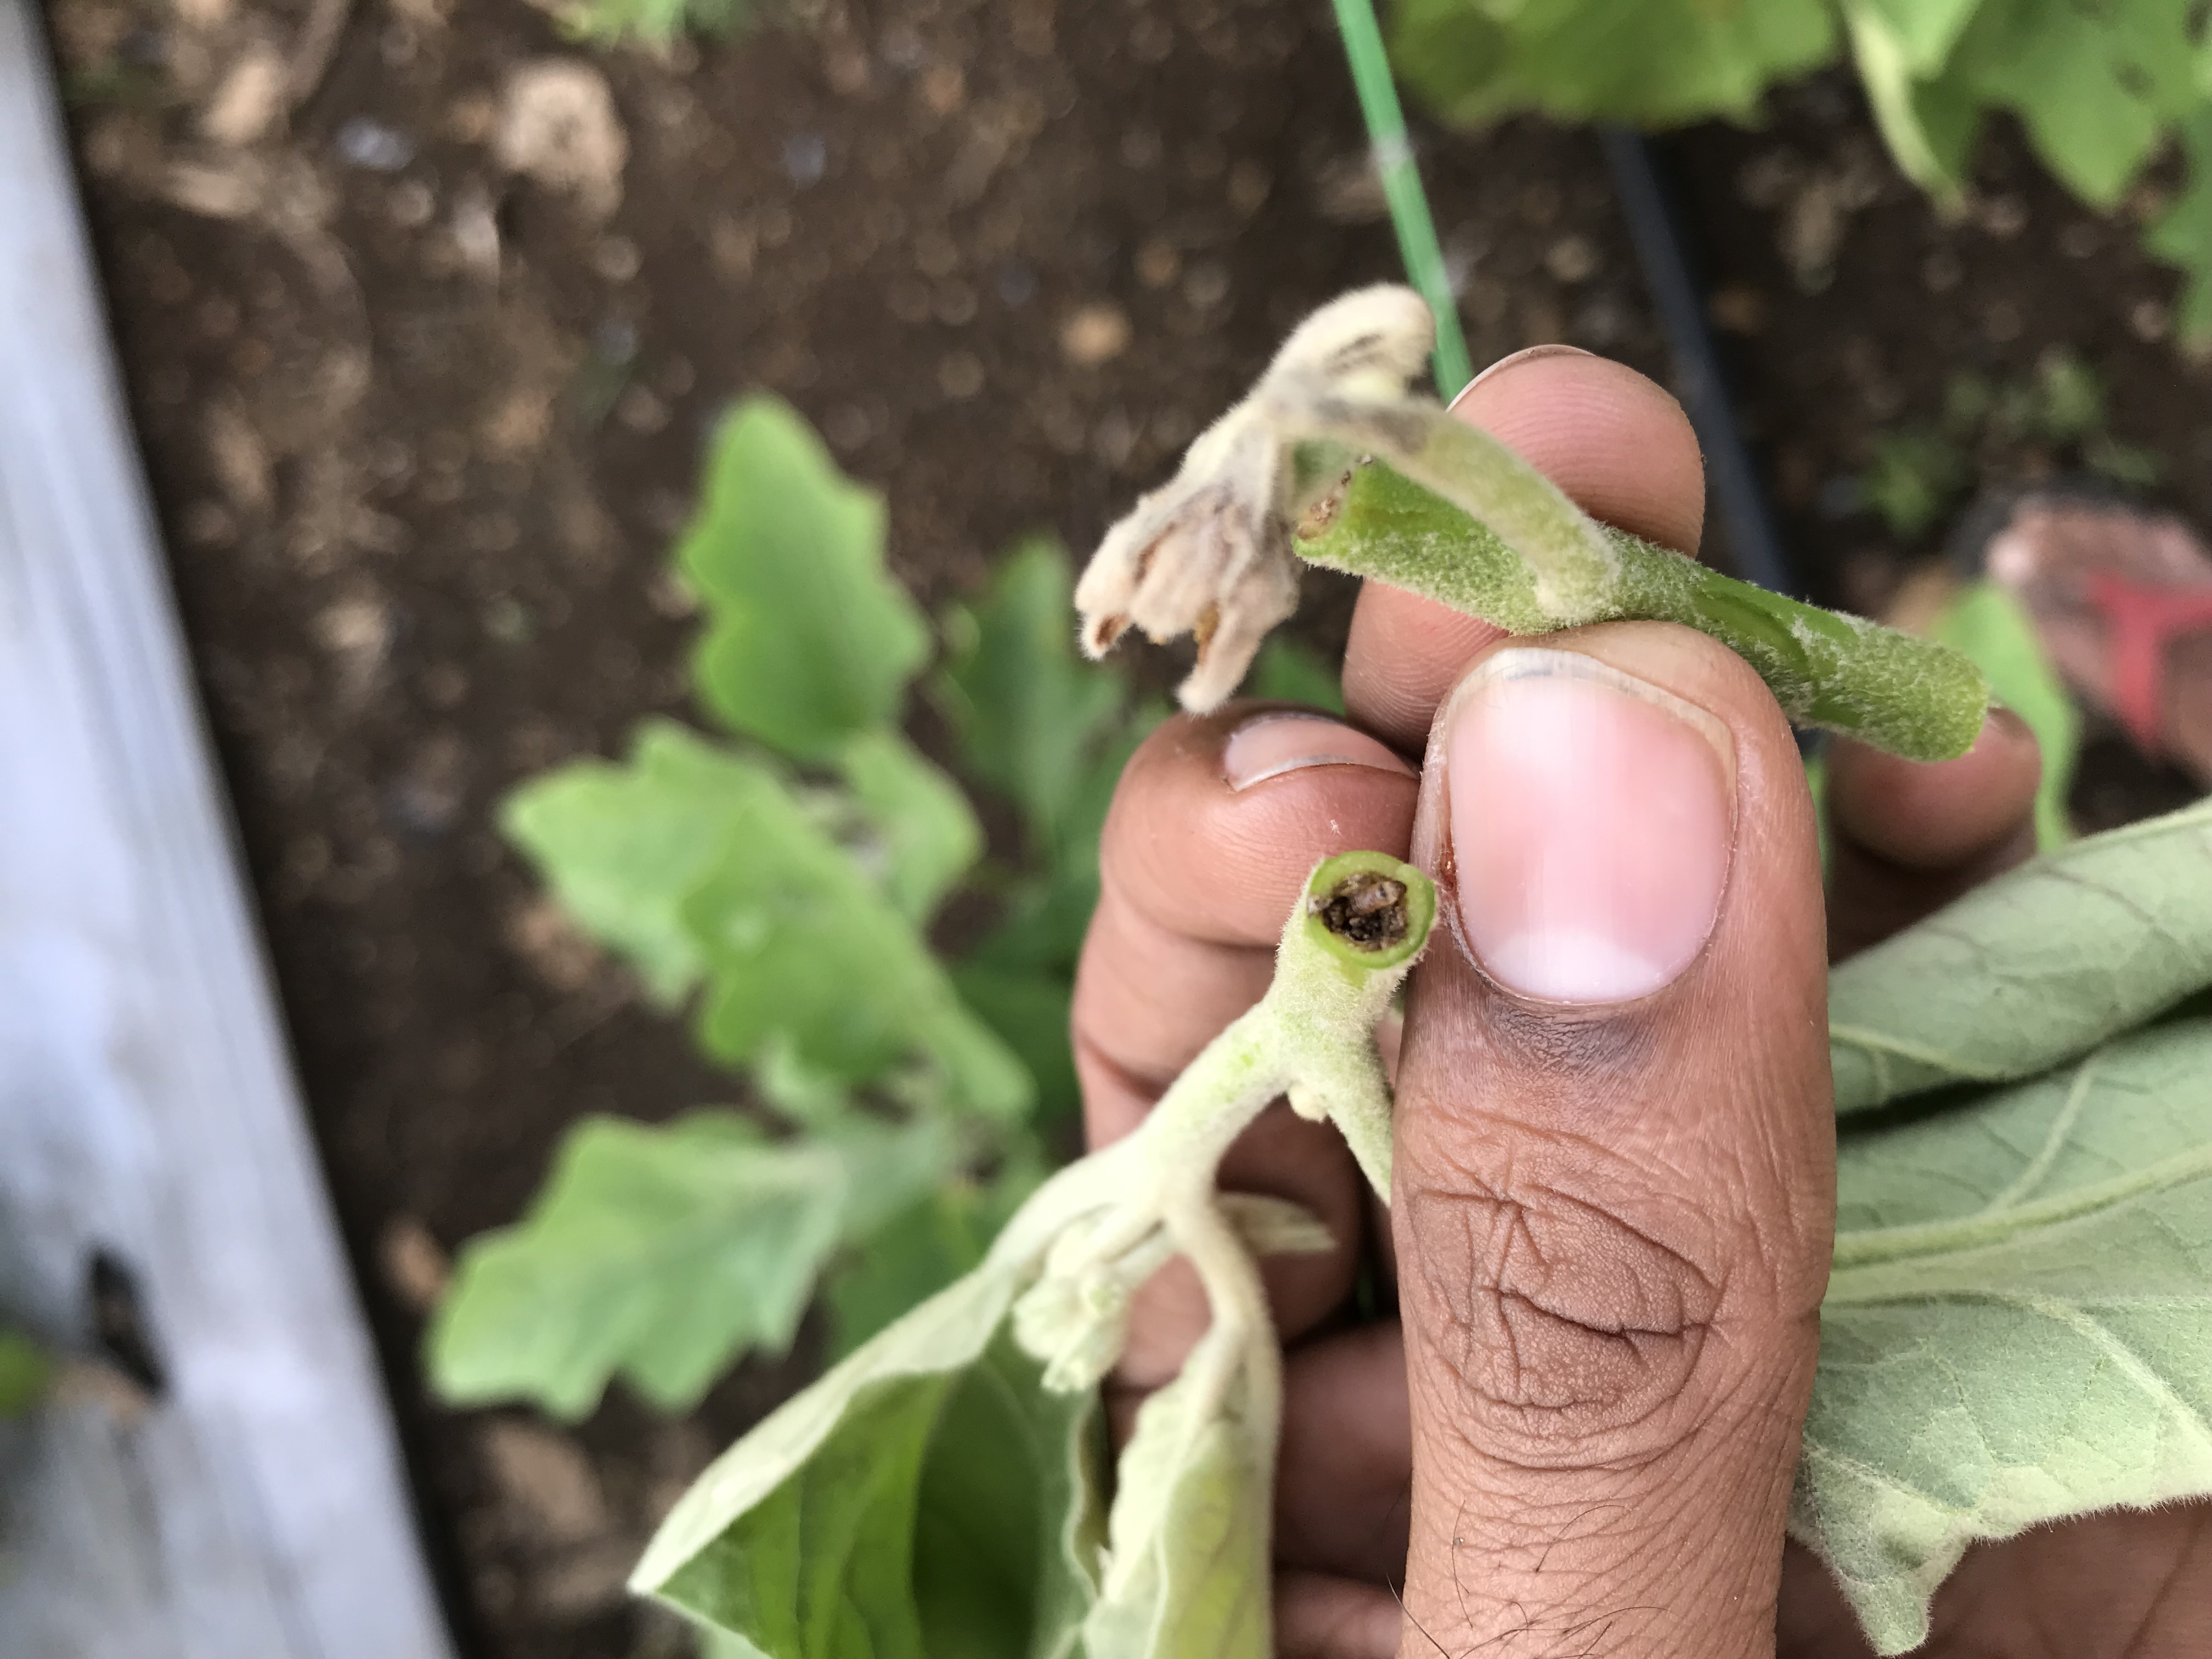 Leucinodes Orbonalis/Egg Plant (Brinjal) Shoot and Fruit Borer